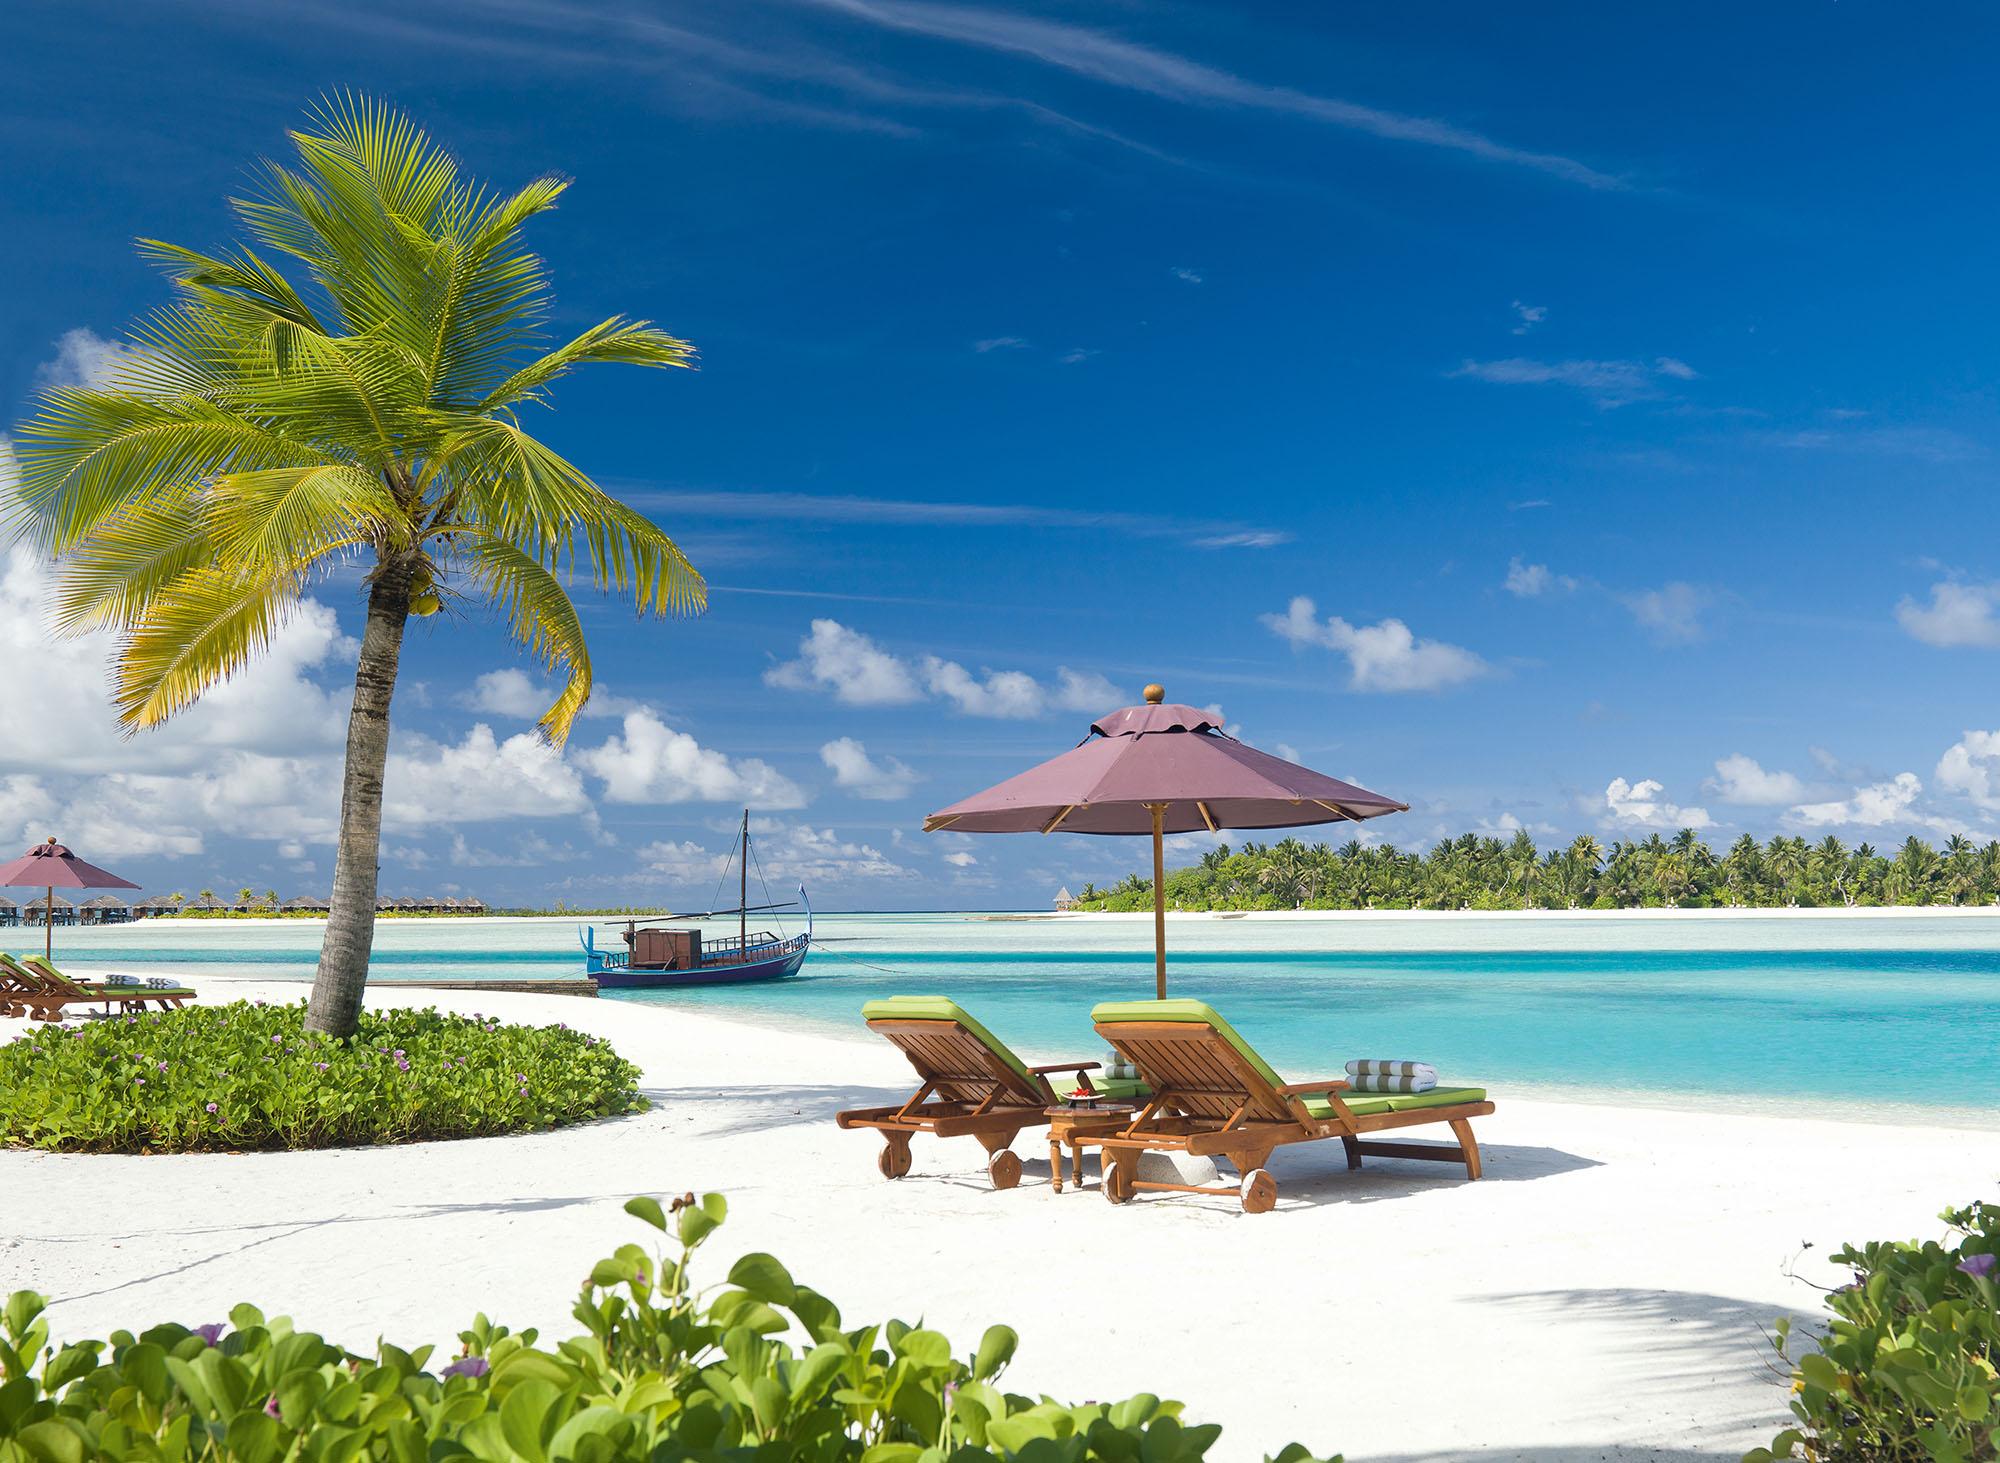 Naladhu island. Isla privada en Mauricio para Nochevieja